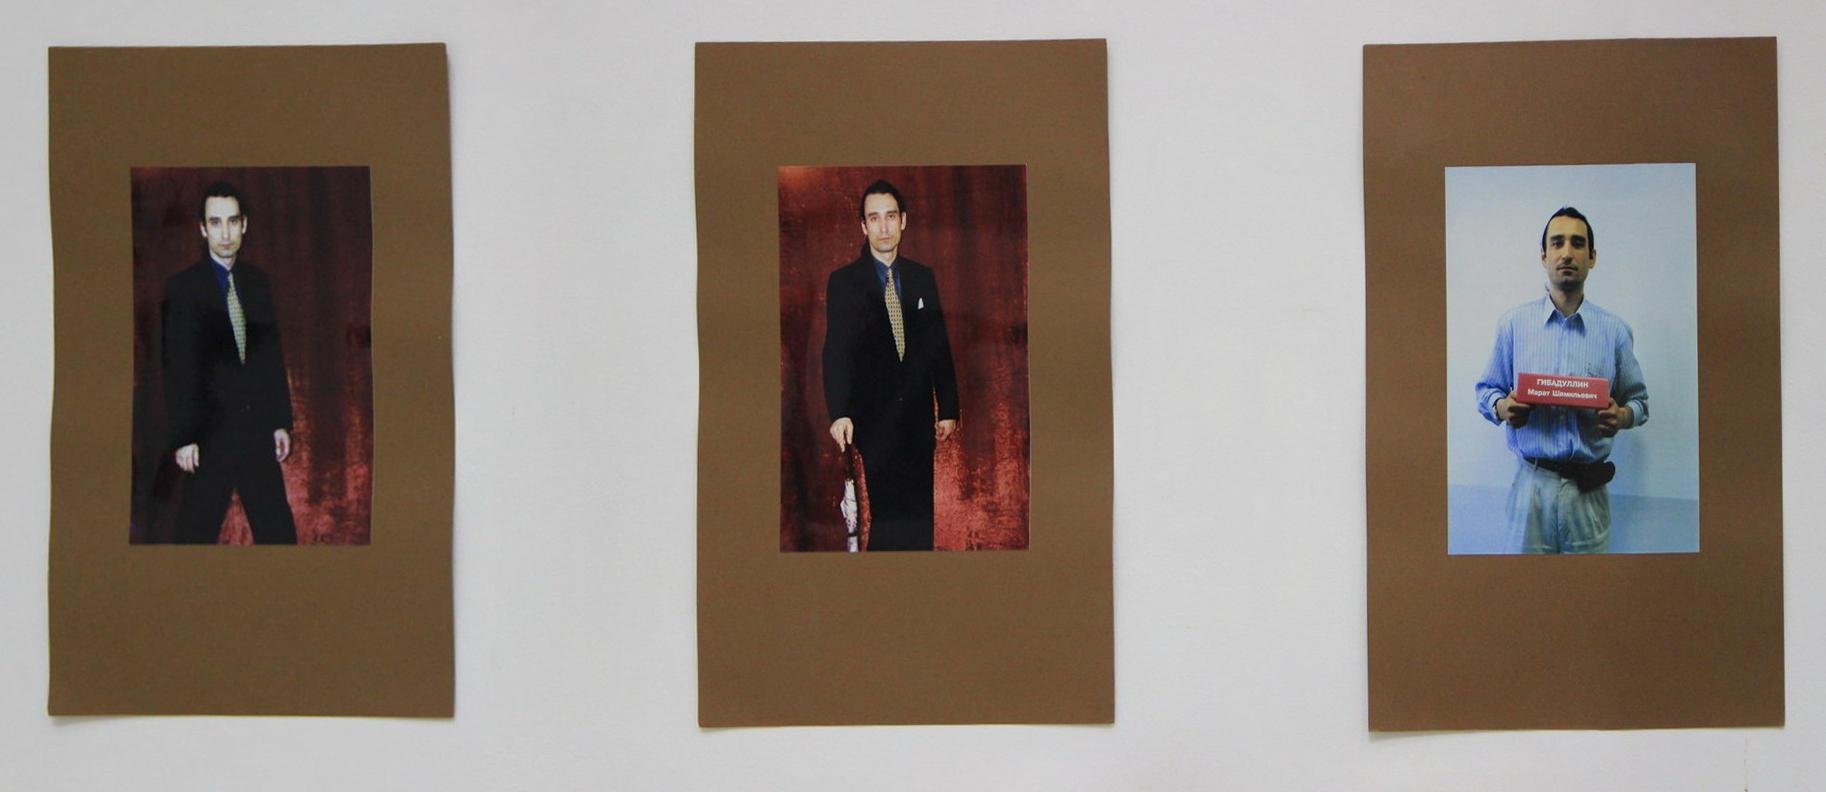 Александр Николаев. Хочу в Голливуд. Фото. Видео-арт, документы. 2006